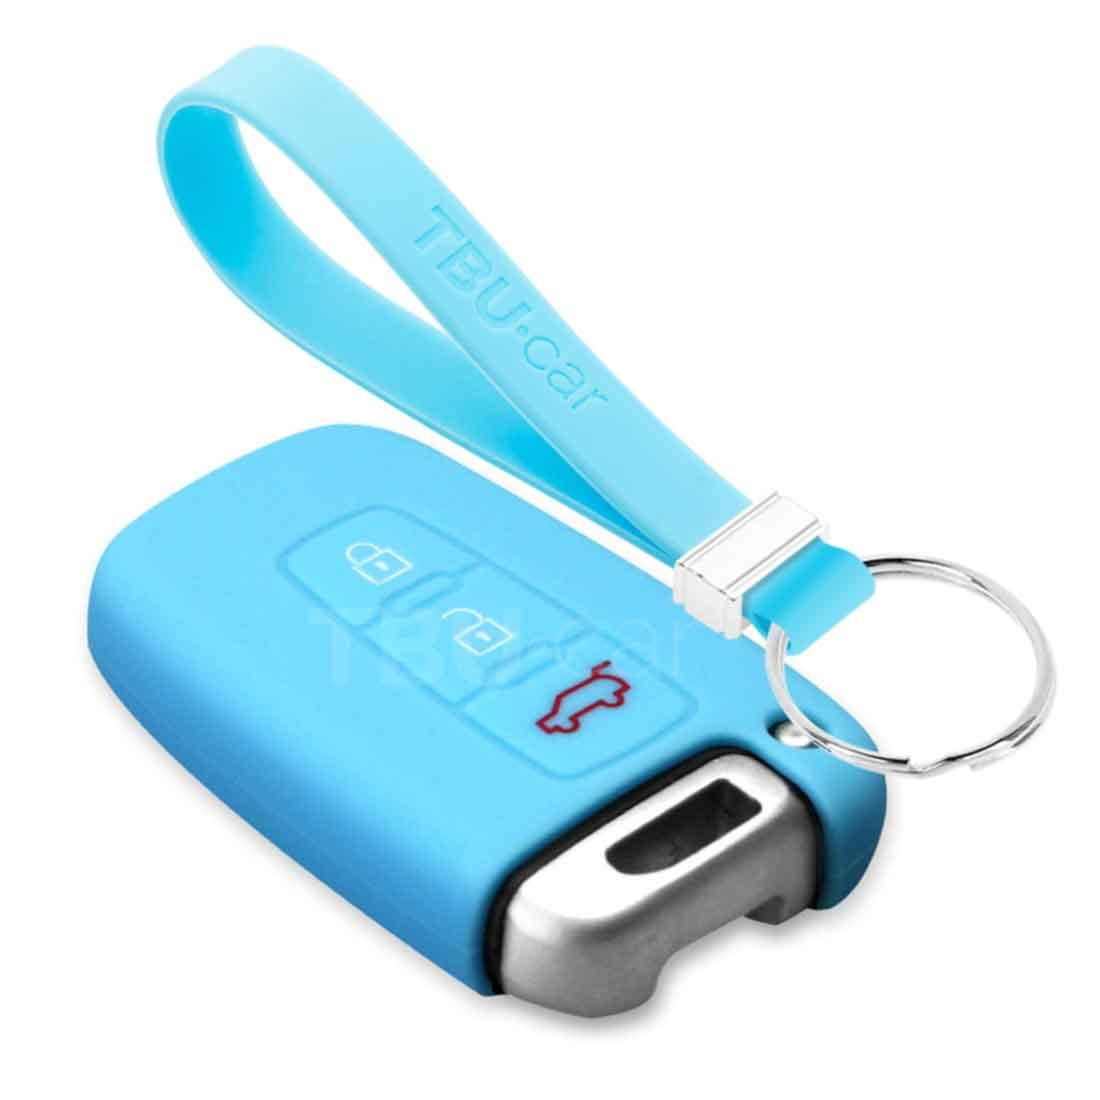 TBU car TBU car Autoschlüssel Hülle kompatibel mit Hyundai 3 Tasten (Keyless Entry) - Schutzhülle aus Silikon - Auto Schlüsselhülle Cover in Hellblau